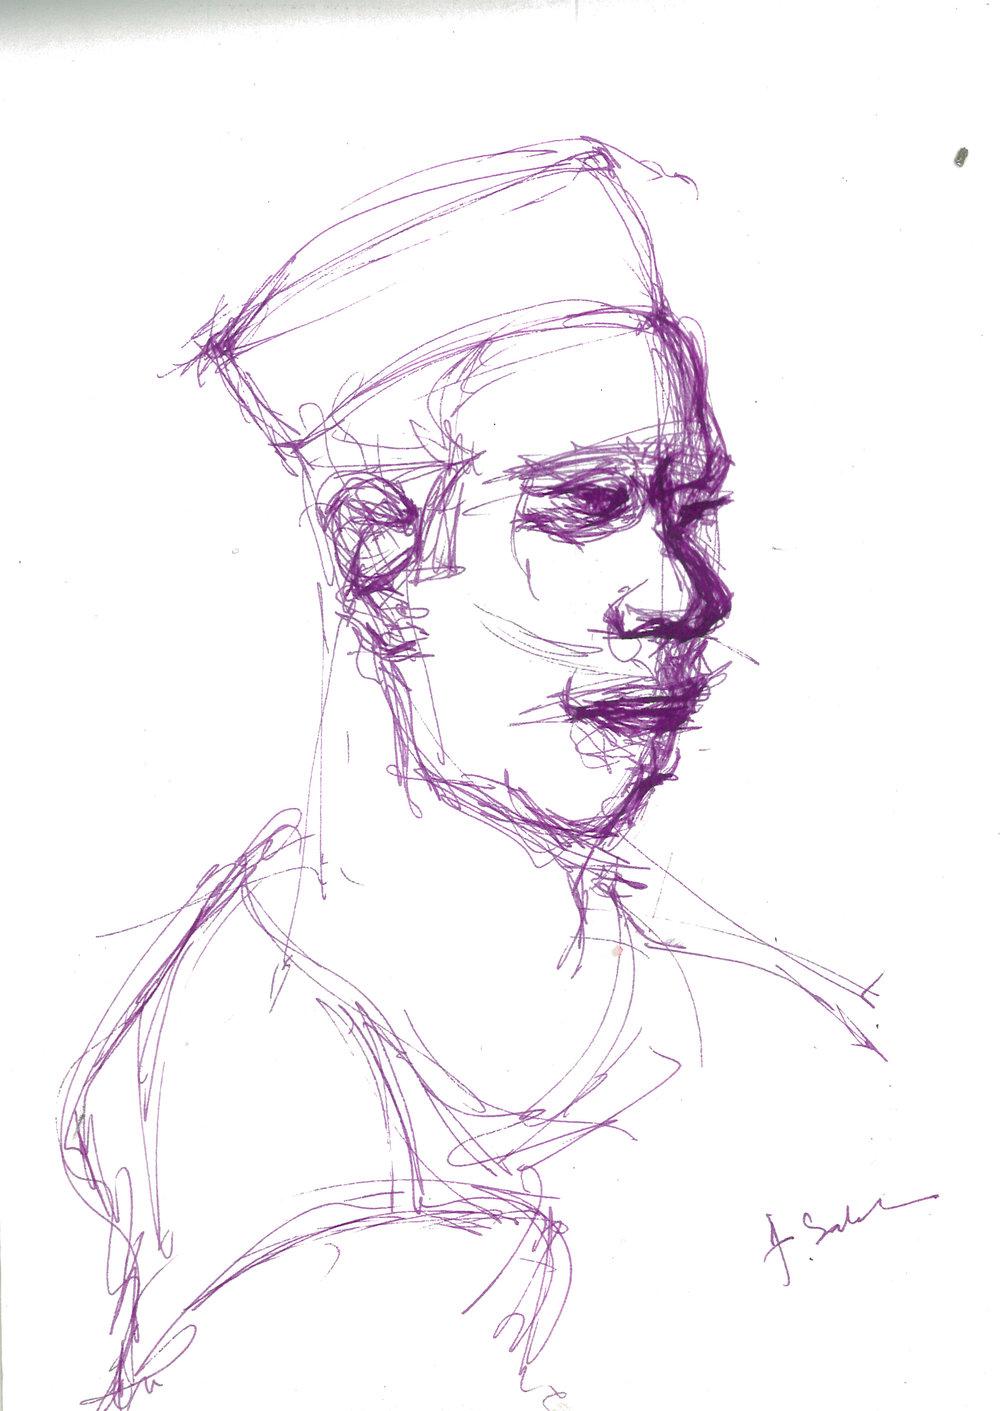 ARCH_SketchbookB_ScanE_Page_3.jpg